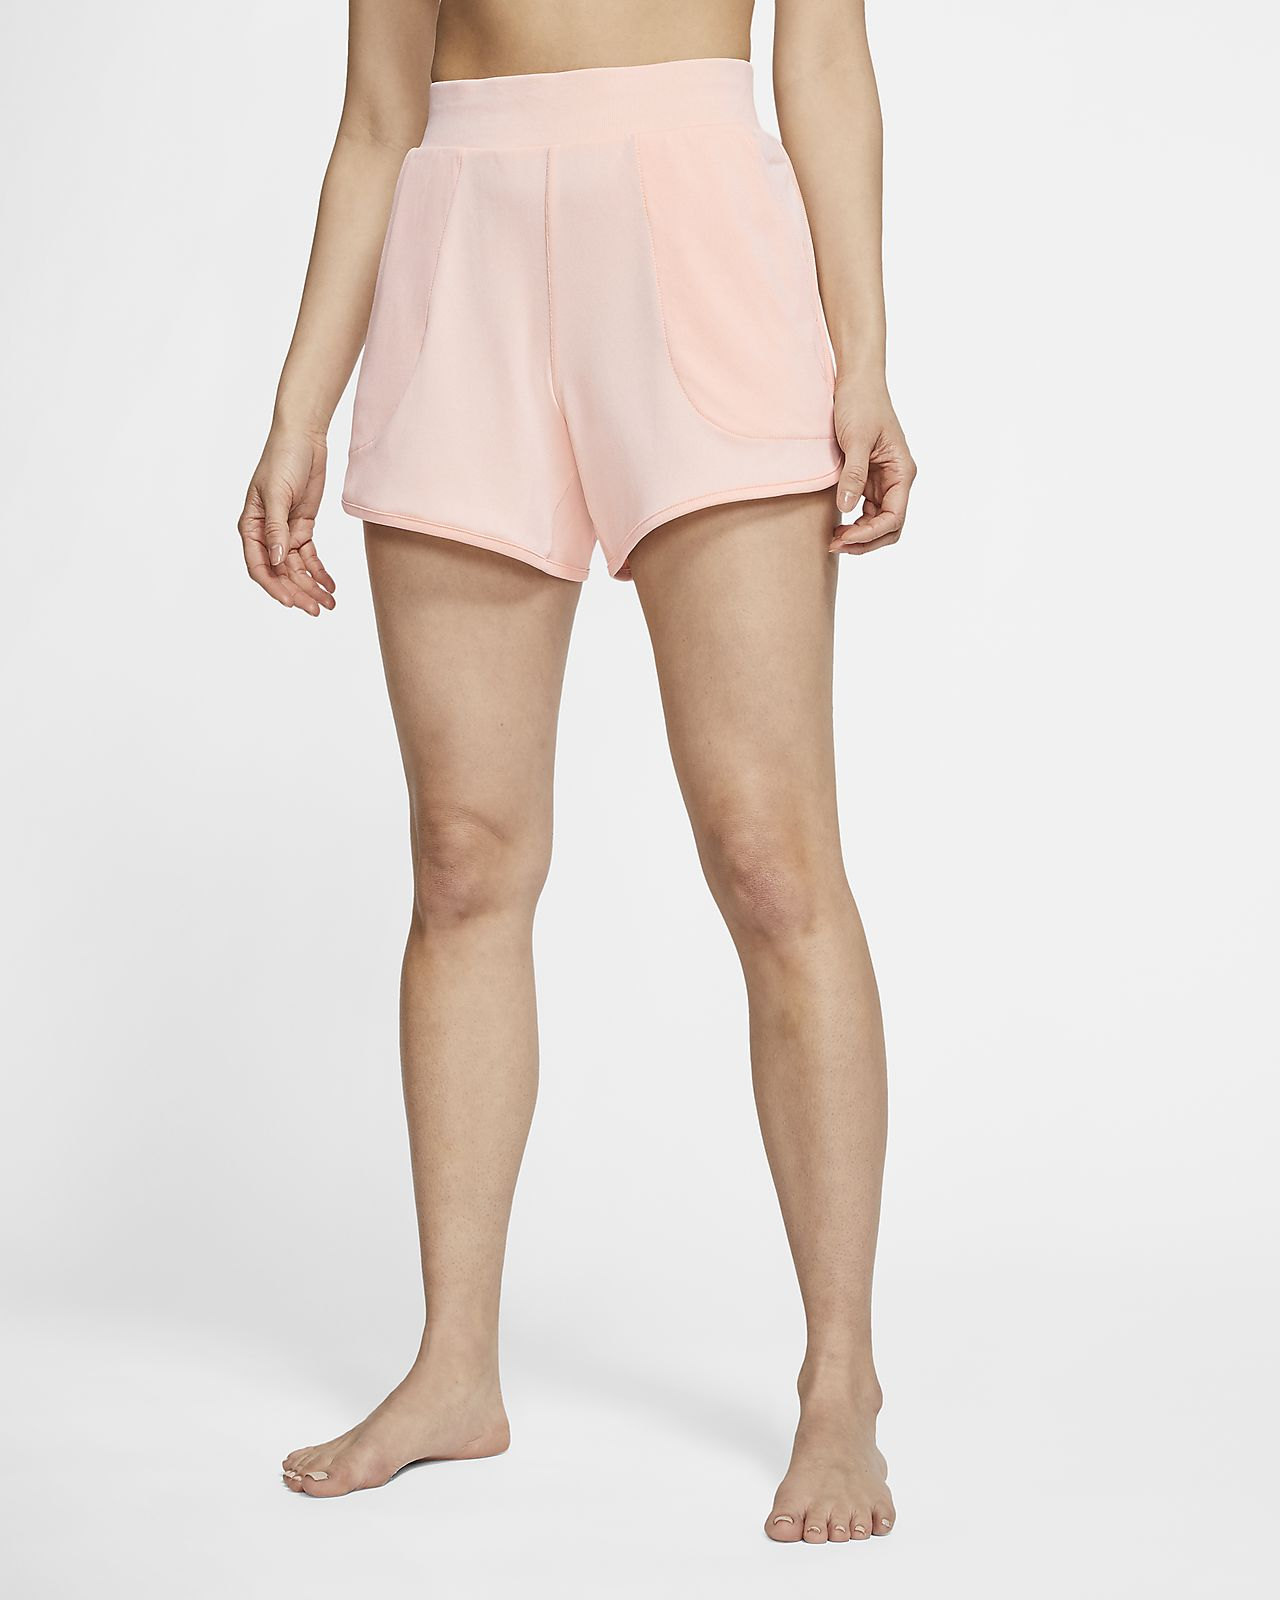 Nike Yoga Women's Ribbed Shorts